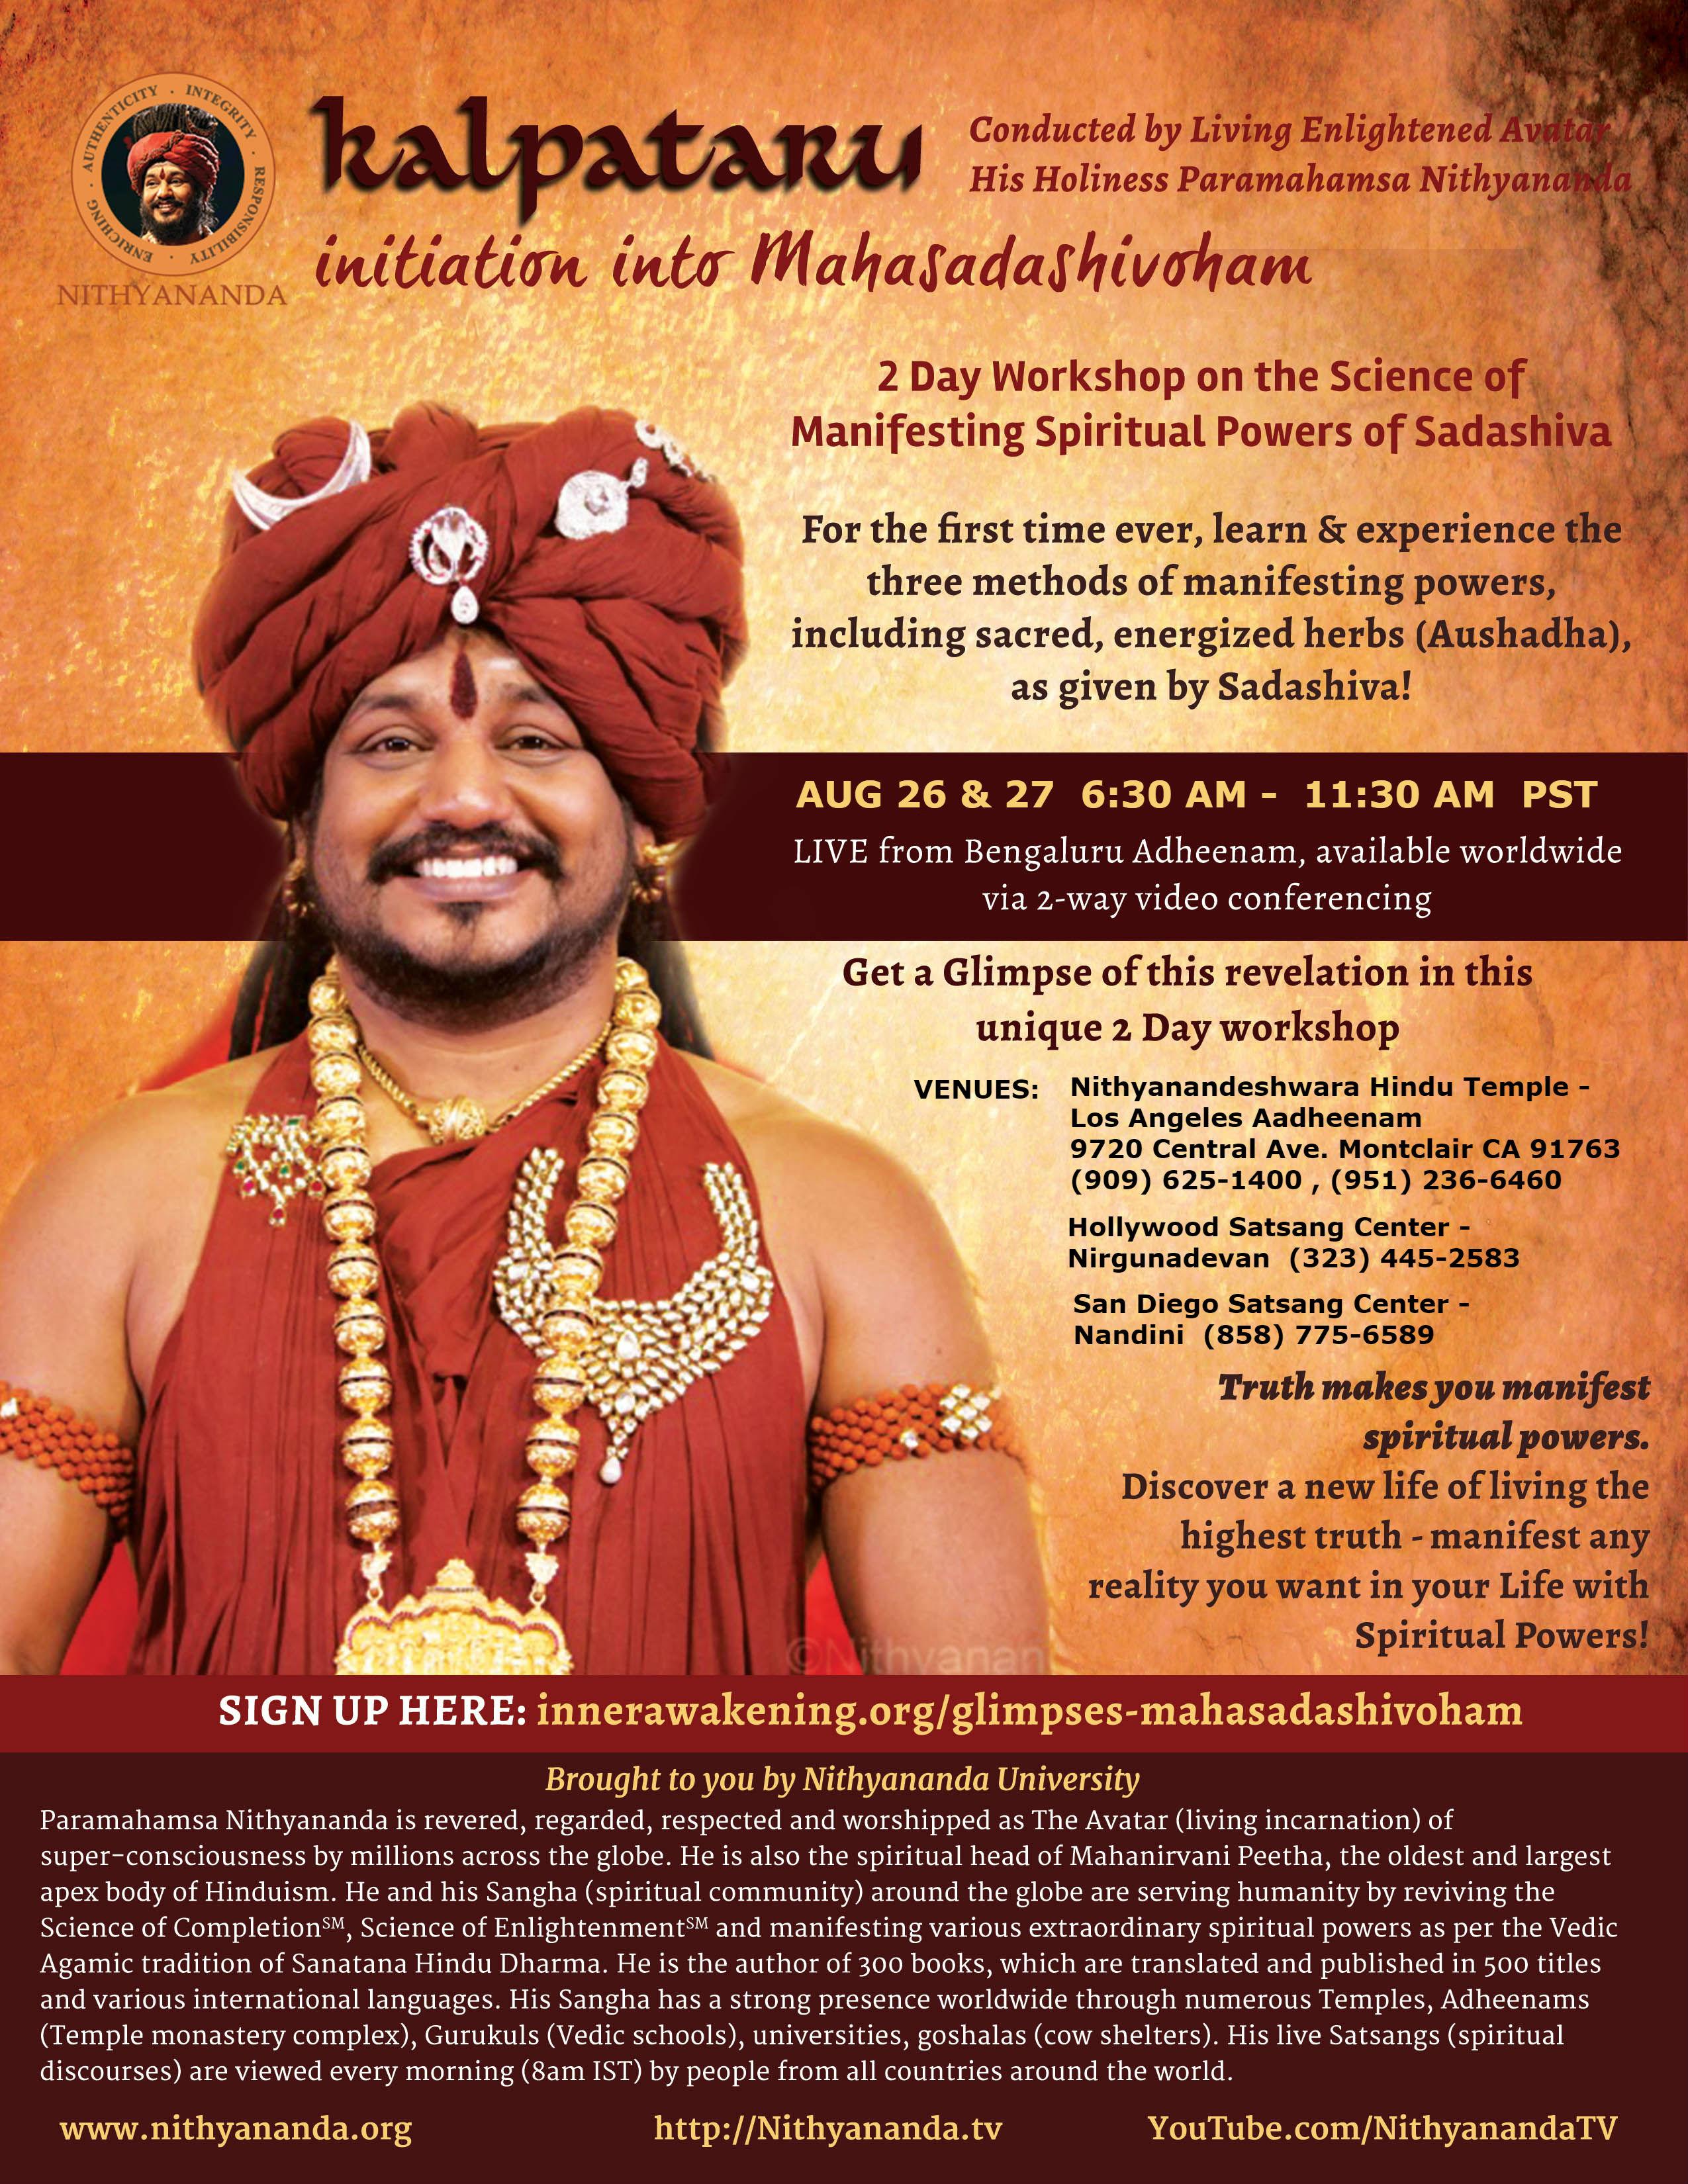 http://nithyanandeshwarahindutemple.org/losangeles/wp-content/uploads/2017/07/Kalpataru_Mahasadashivoham.jpg